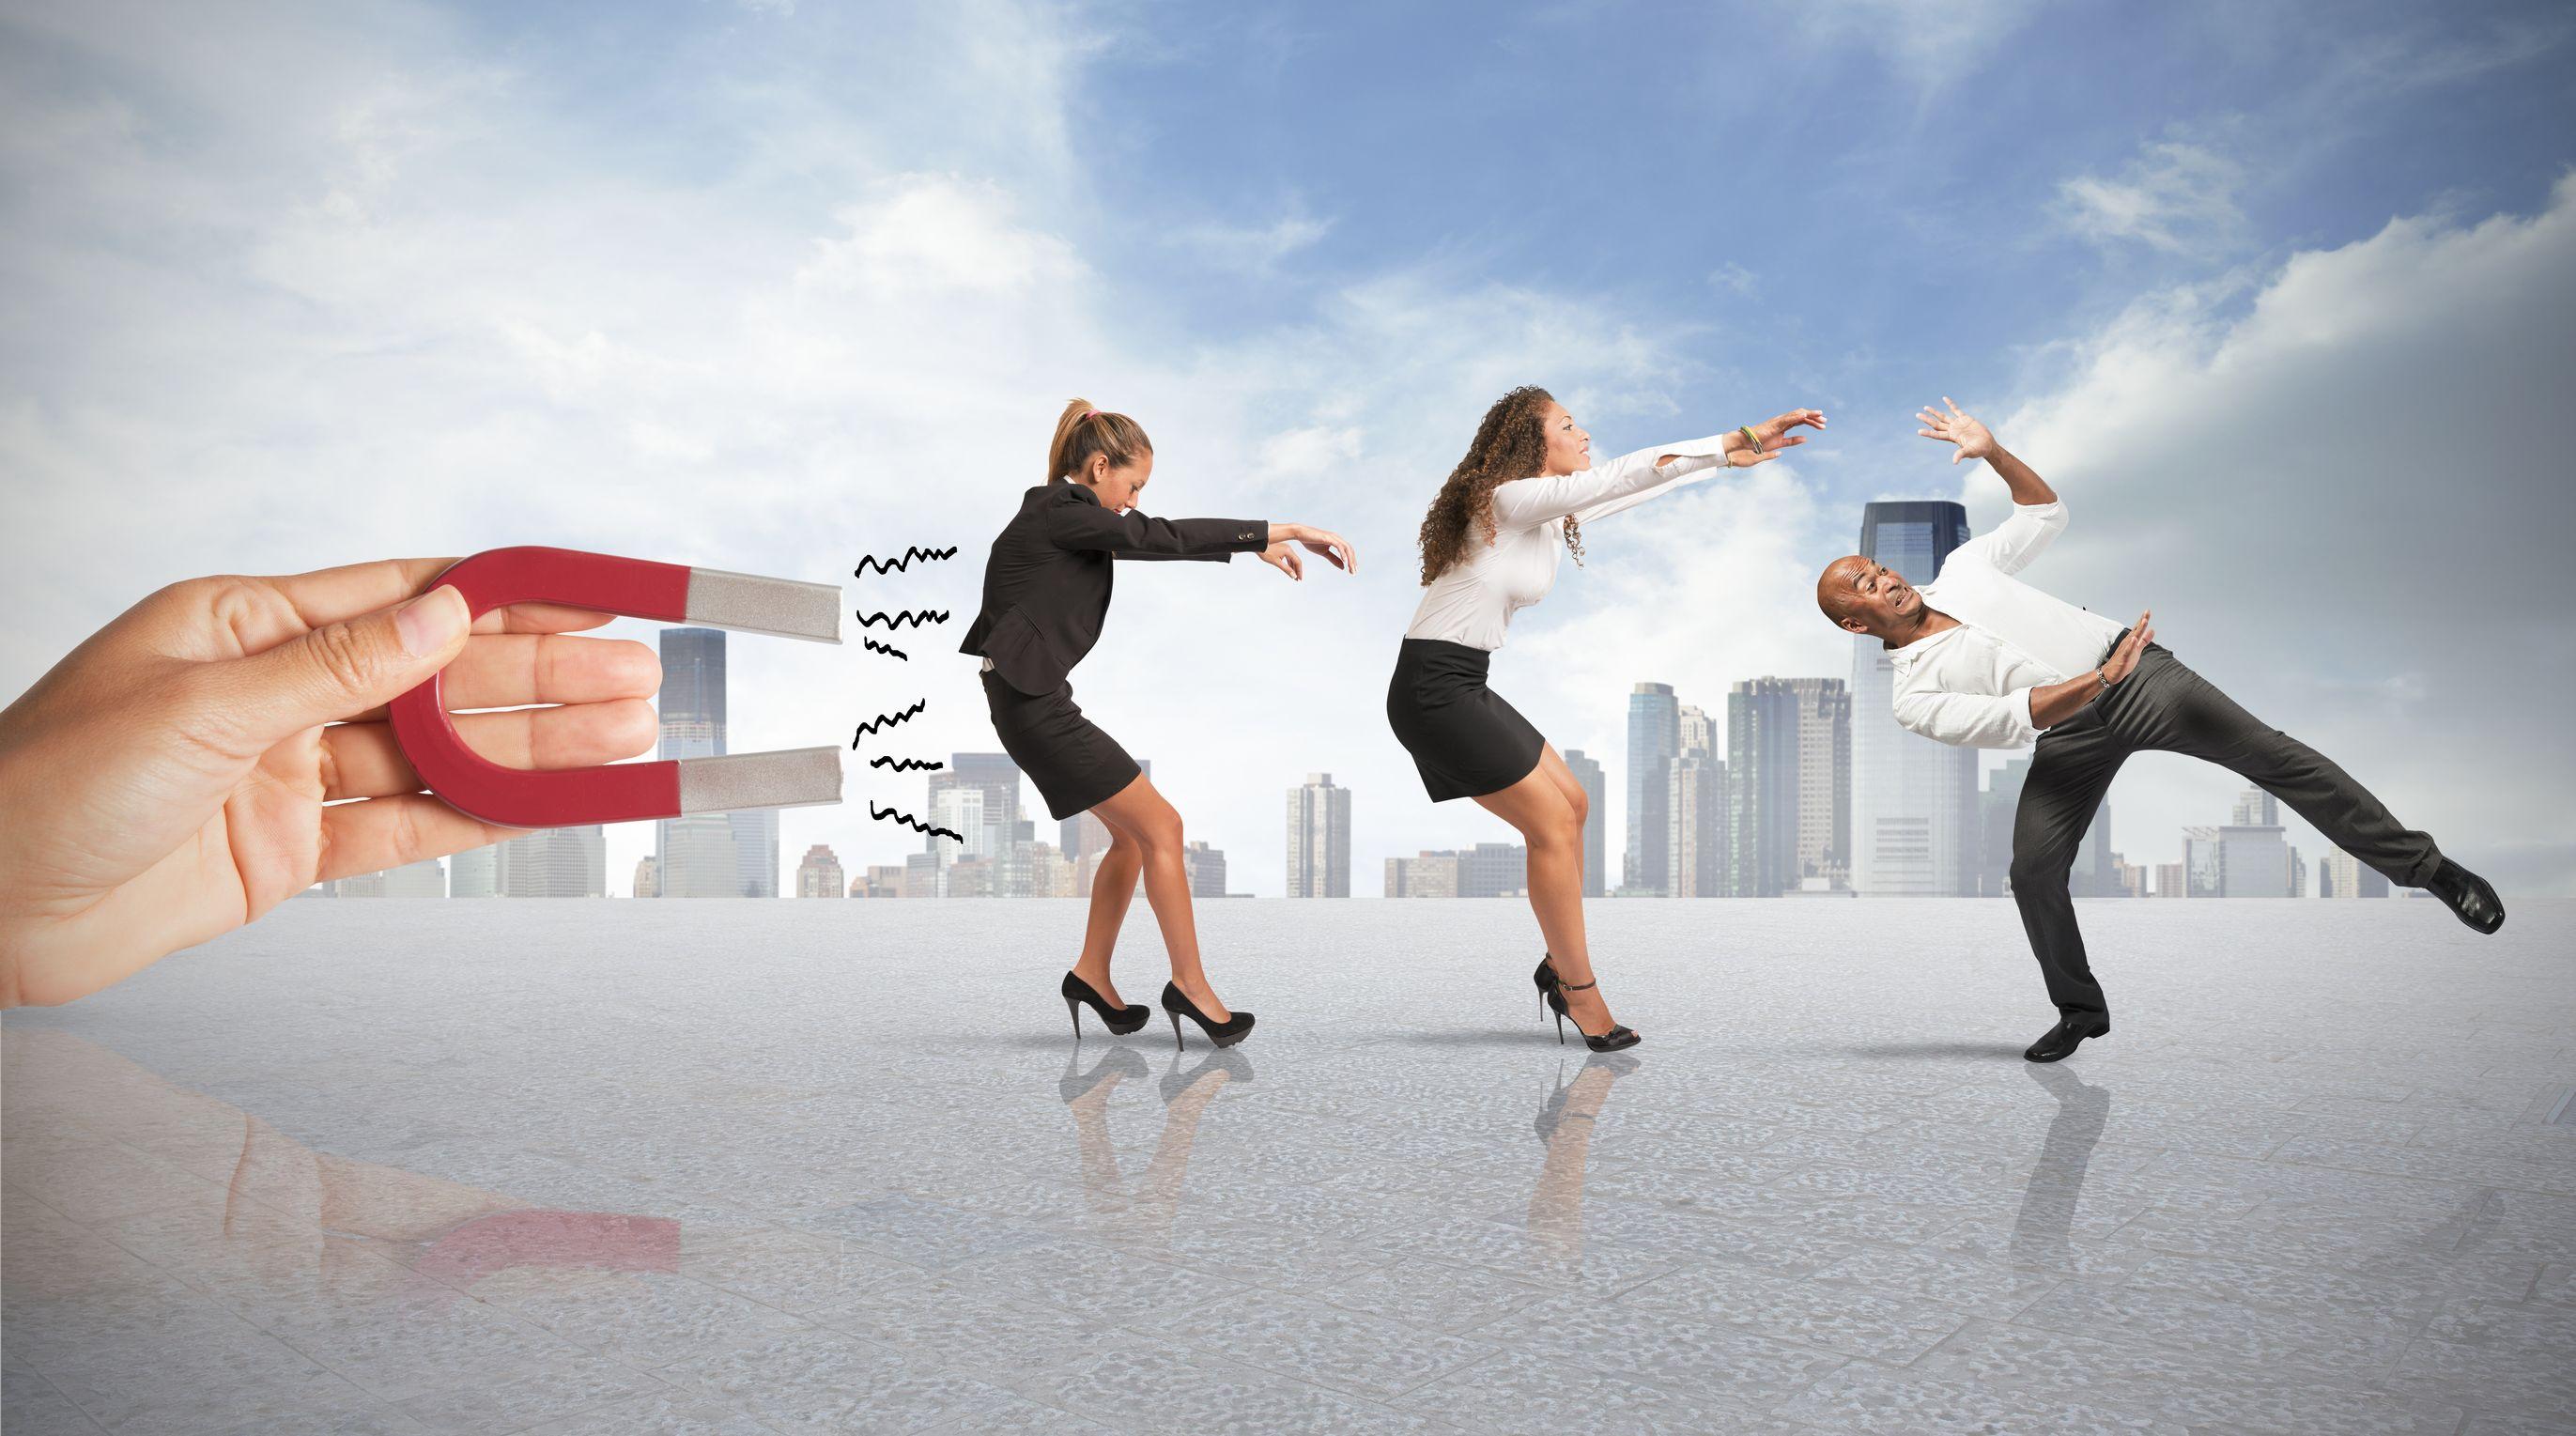 inbound marketing, le marketing entrant